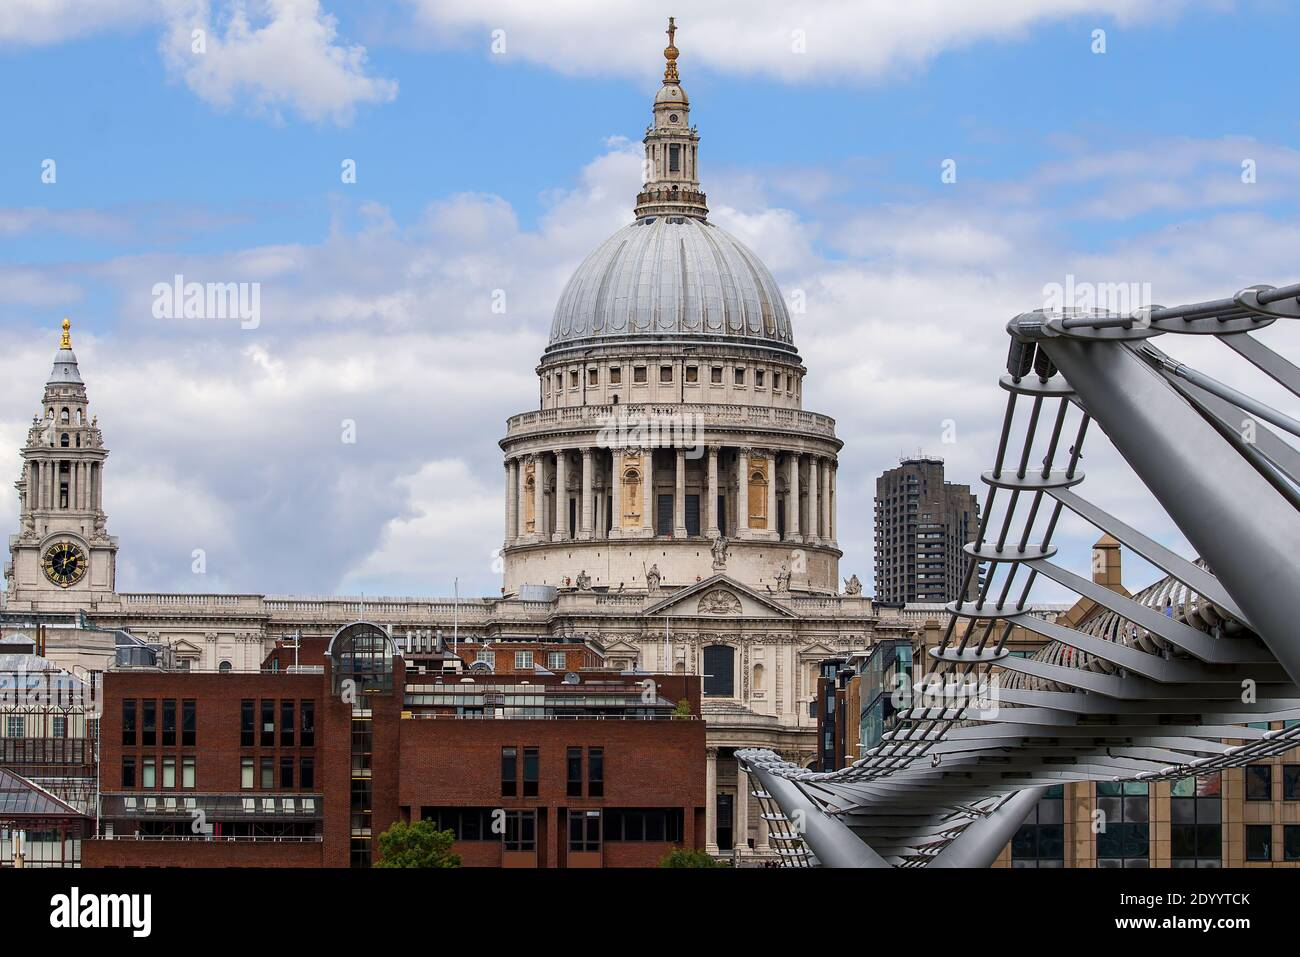 London, UK - April 20, 2020: St Paul's Cathedral in London, UK. Stock Photo